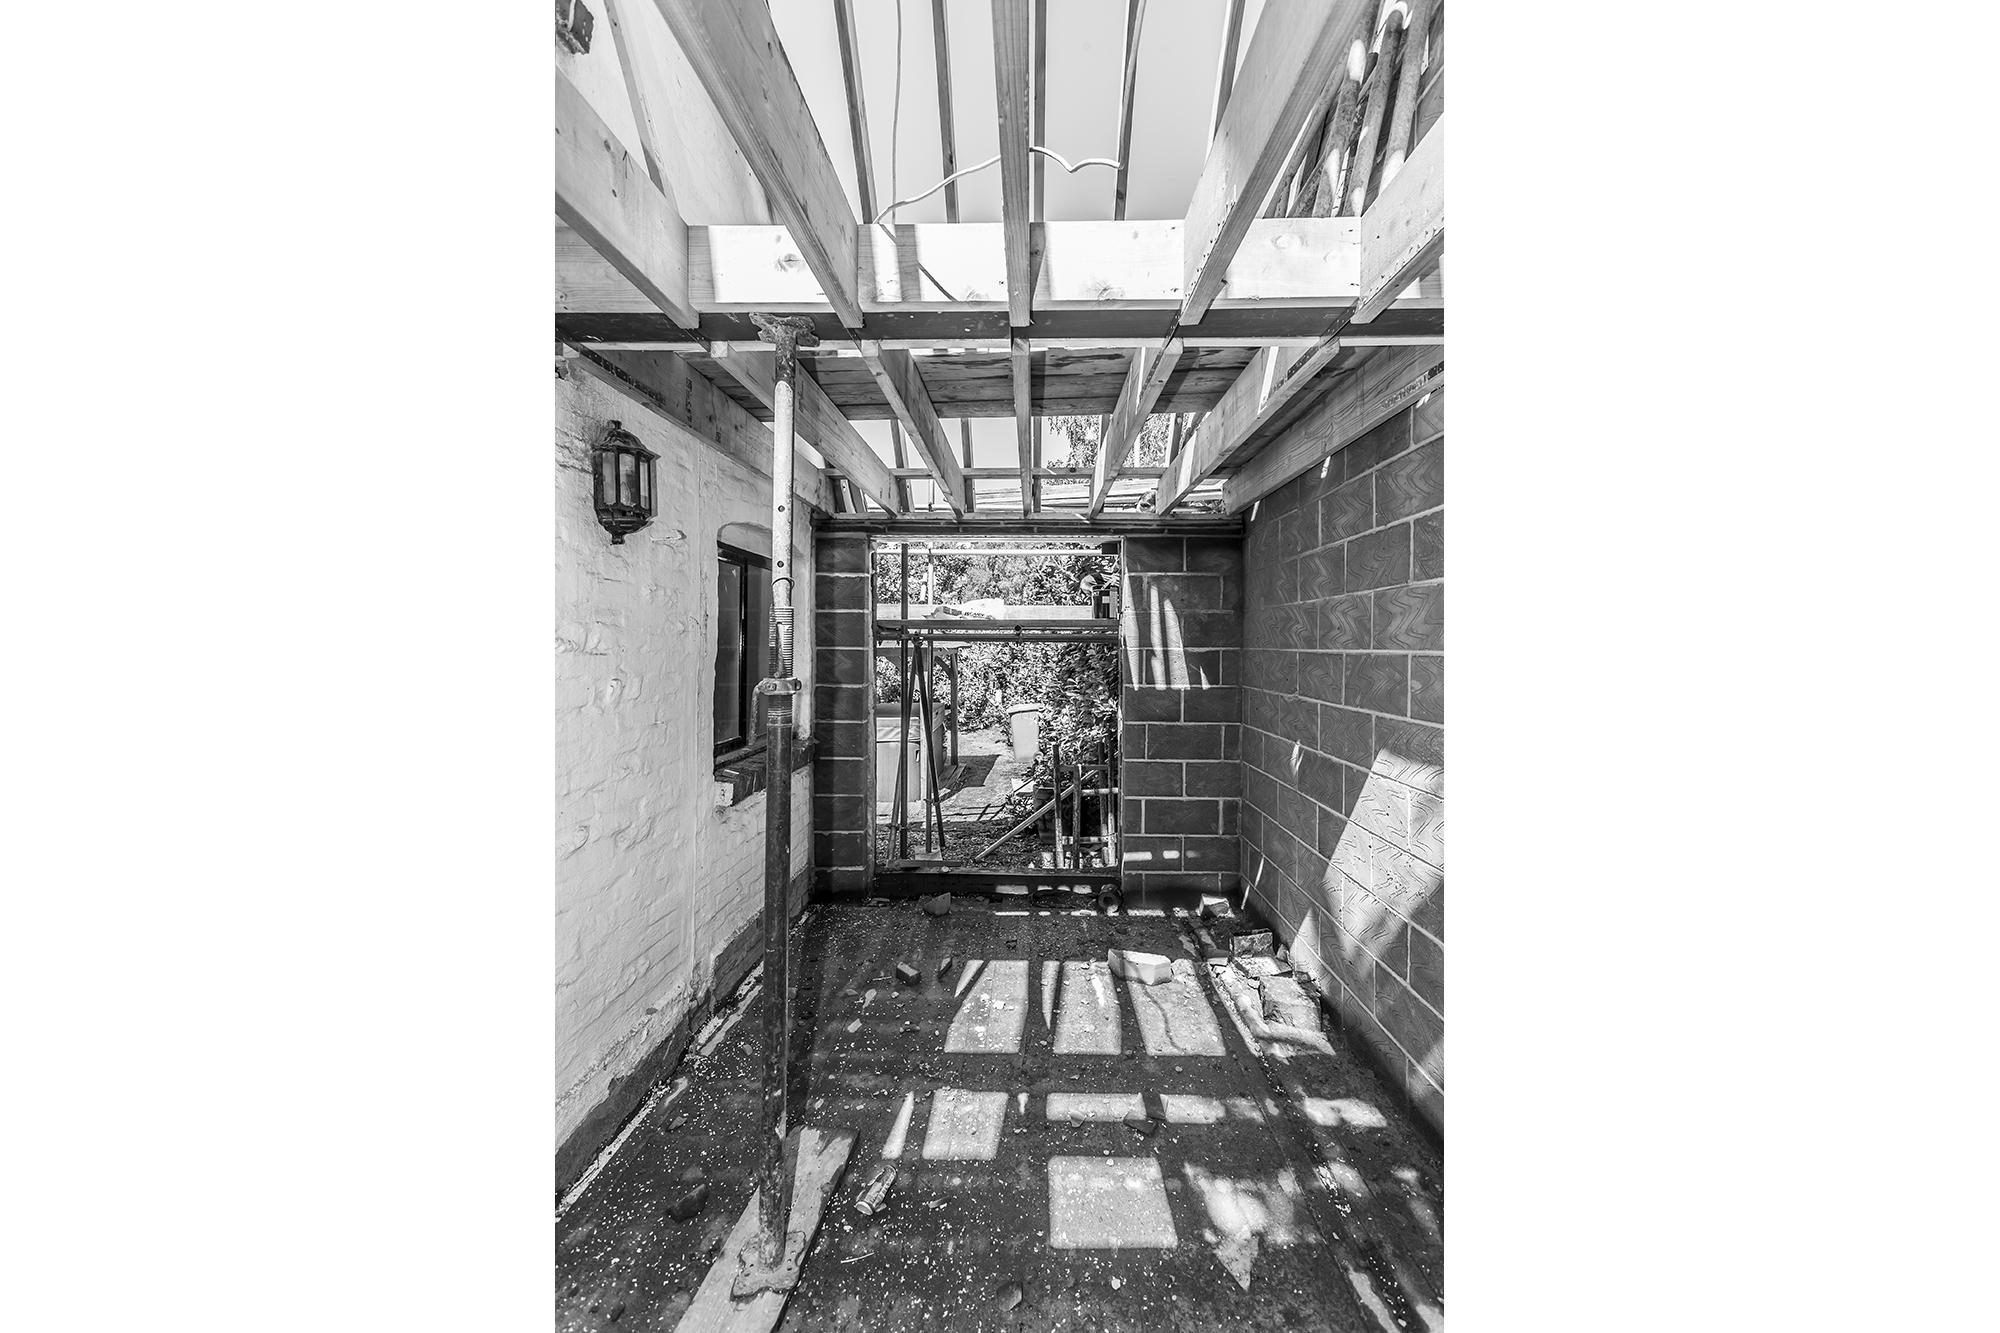 Greenshaw_Construction2_16.jpg